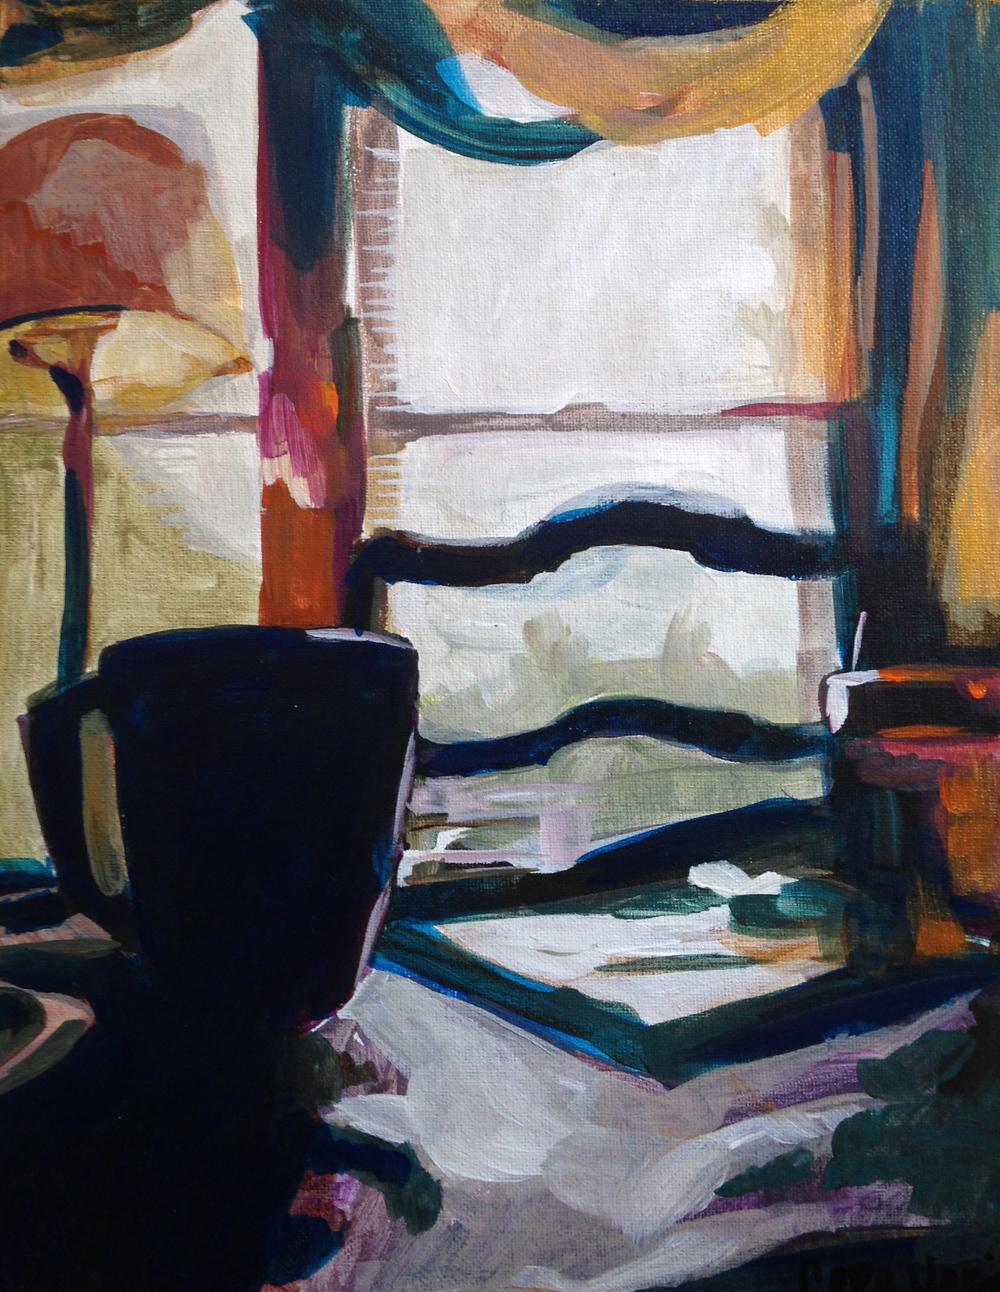 "Morning Brew - Mural Study.  Acrylic on Canvas, 11x14"" 2014"